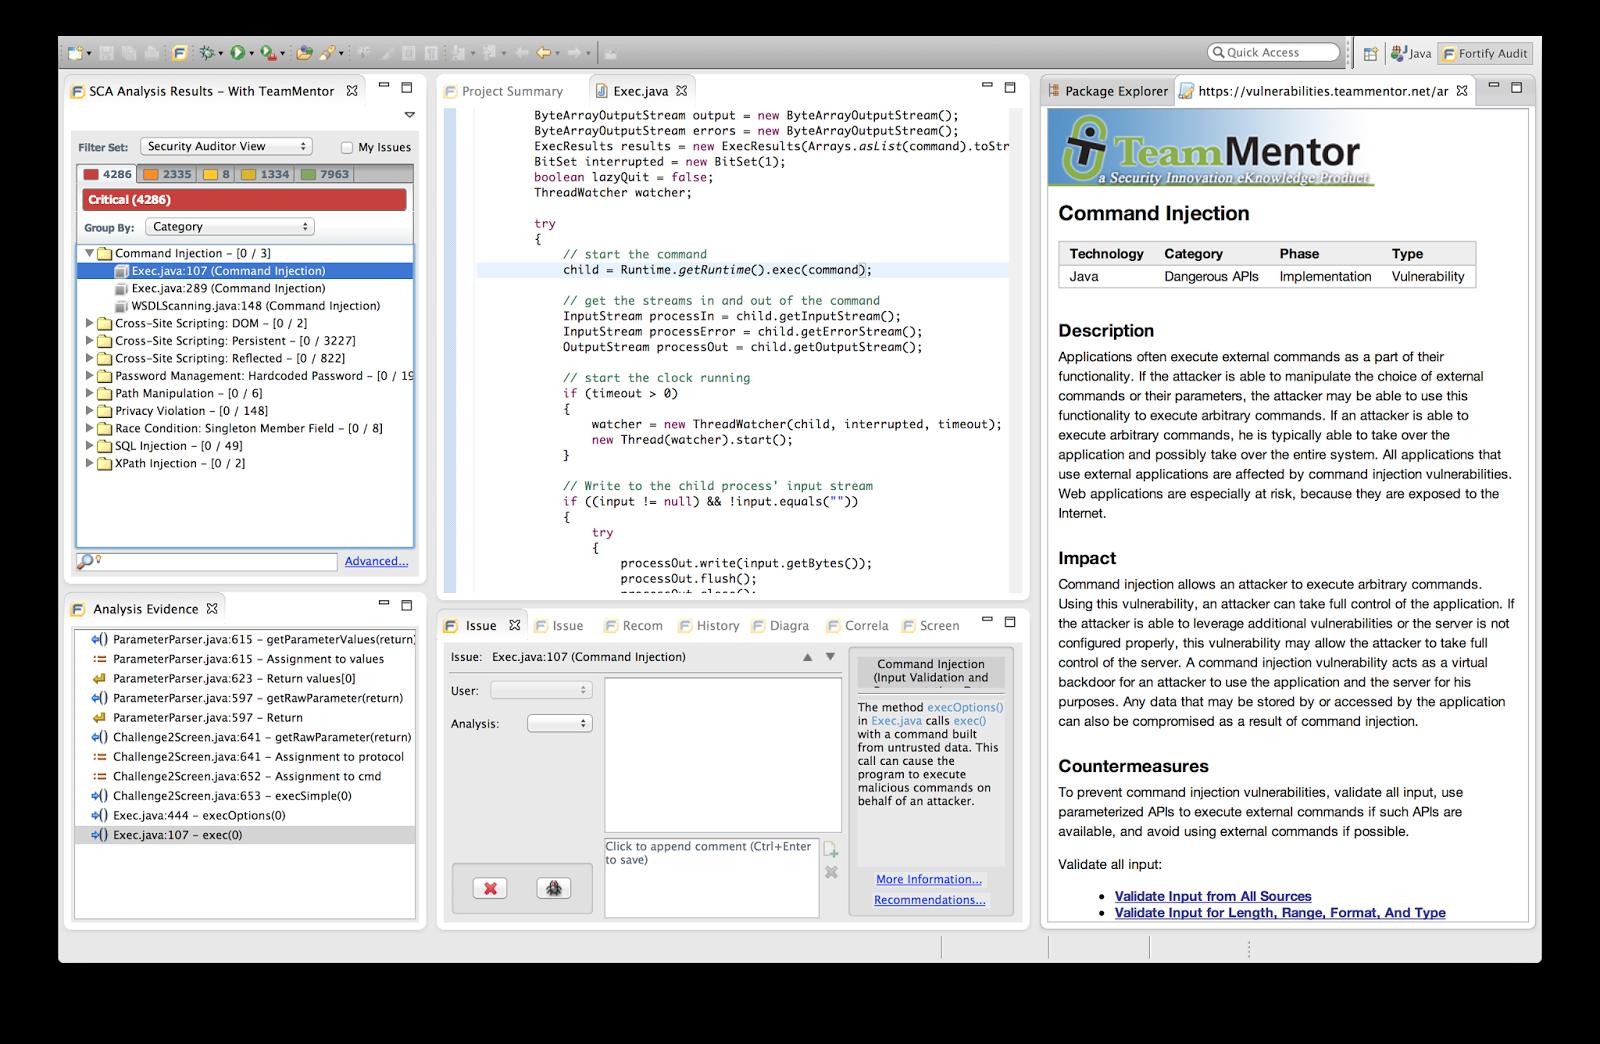 Dinis Cruz Blog: High-Res images of TeamMentor's Fortify integration